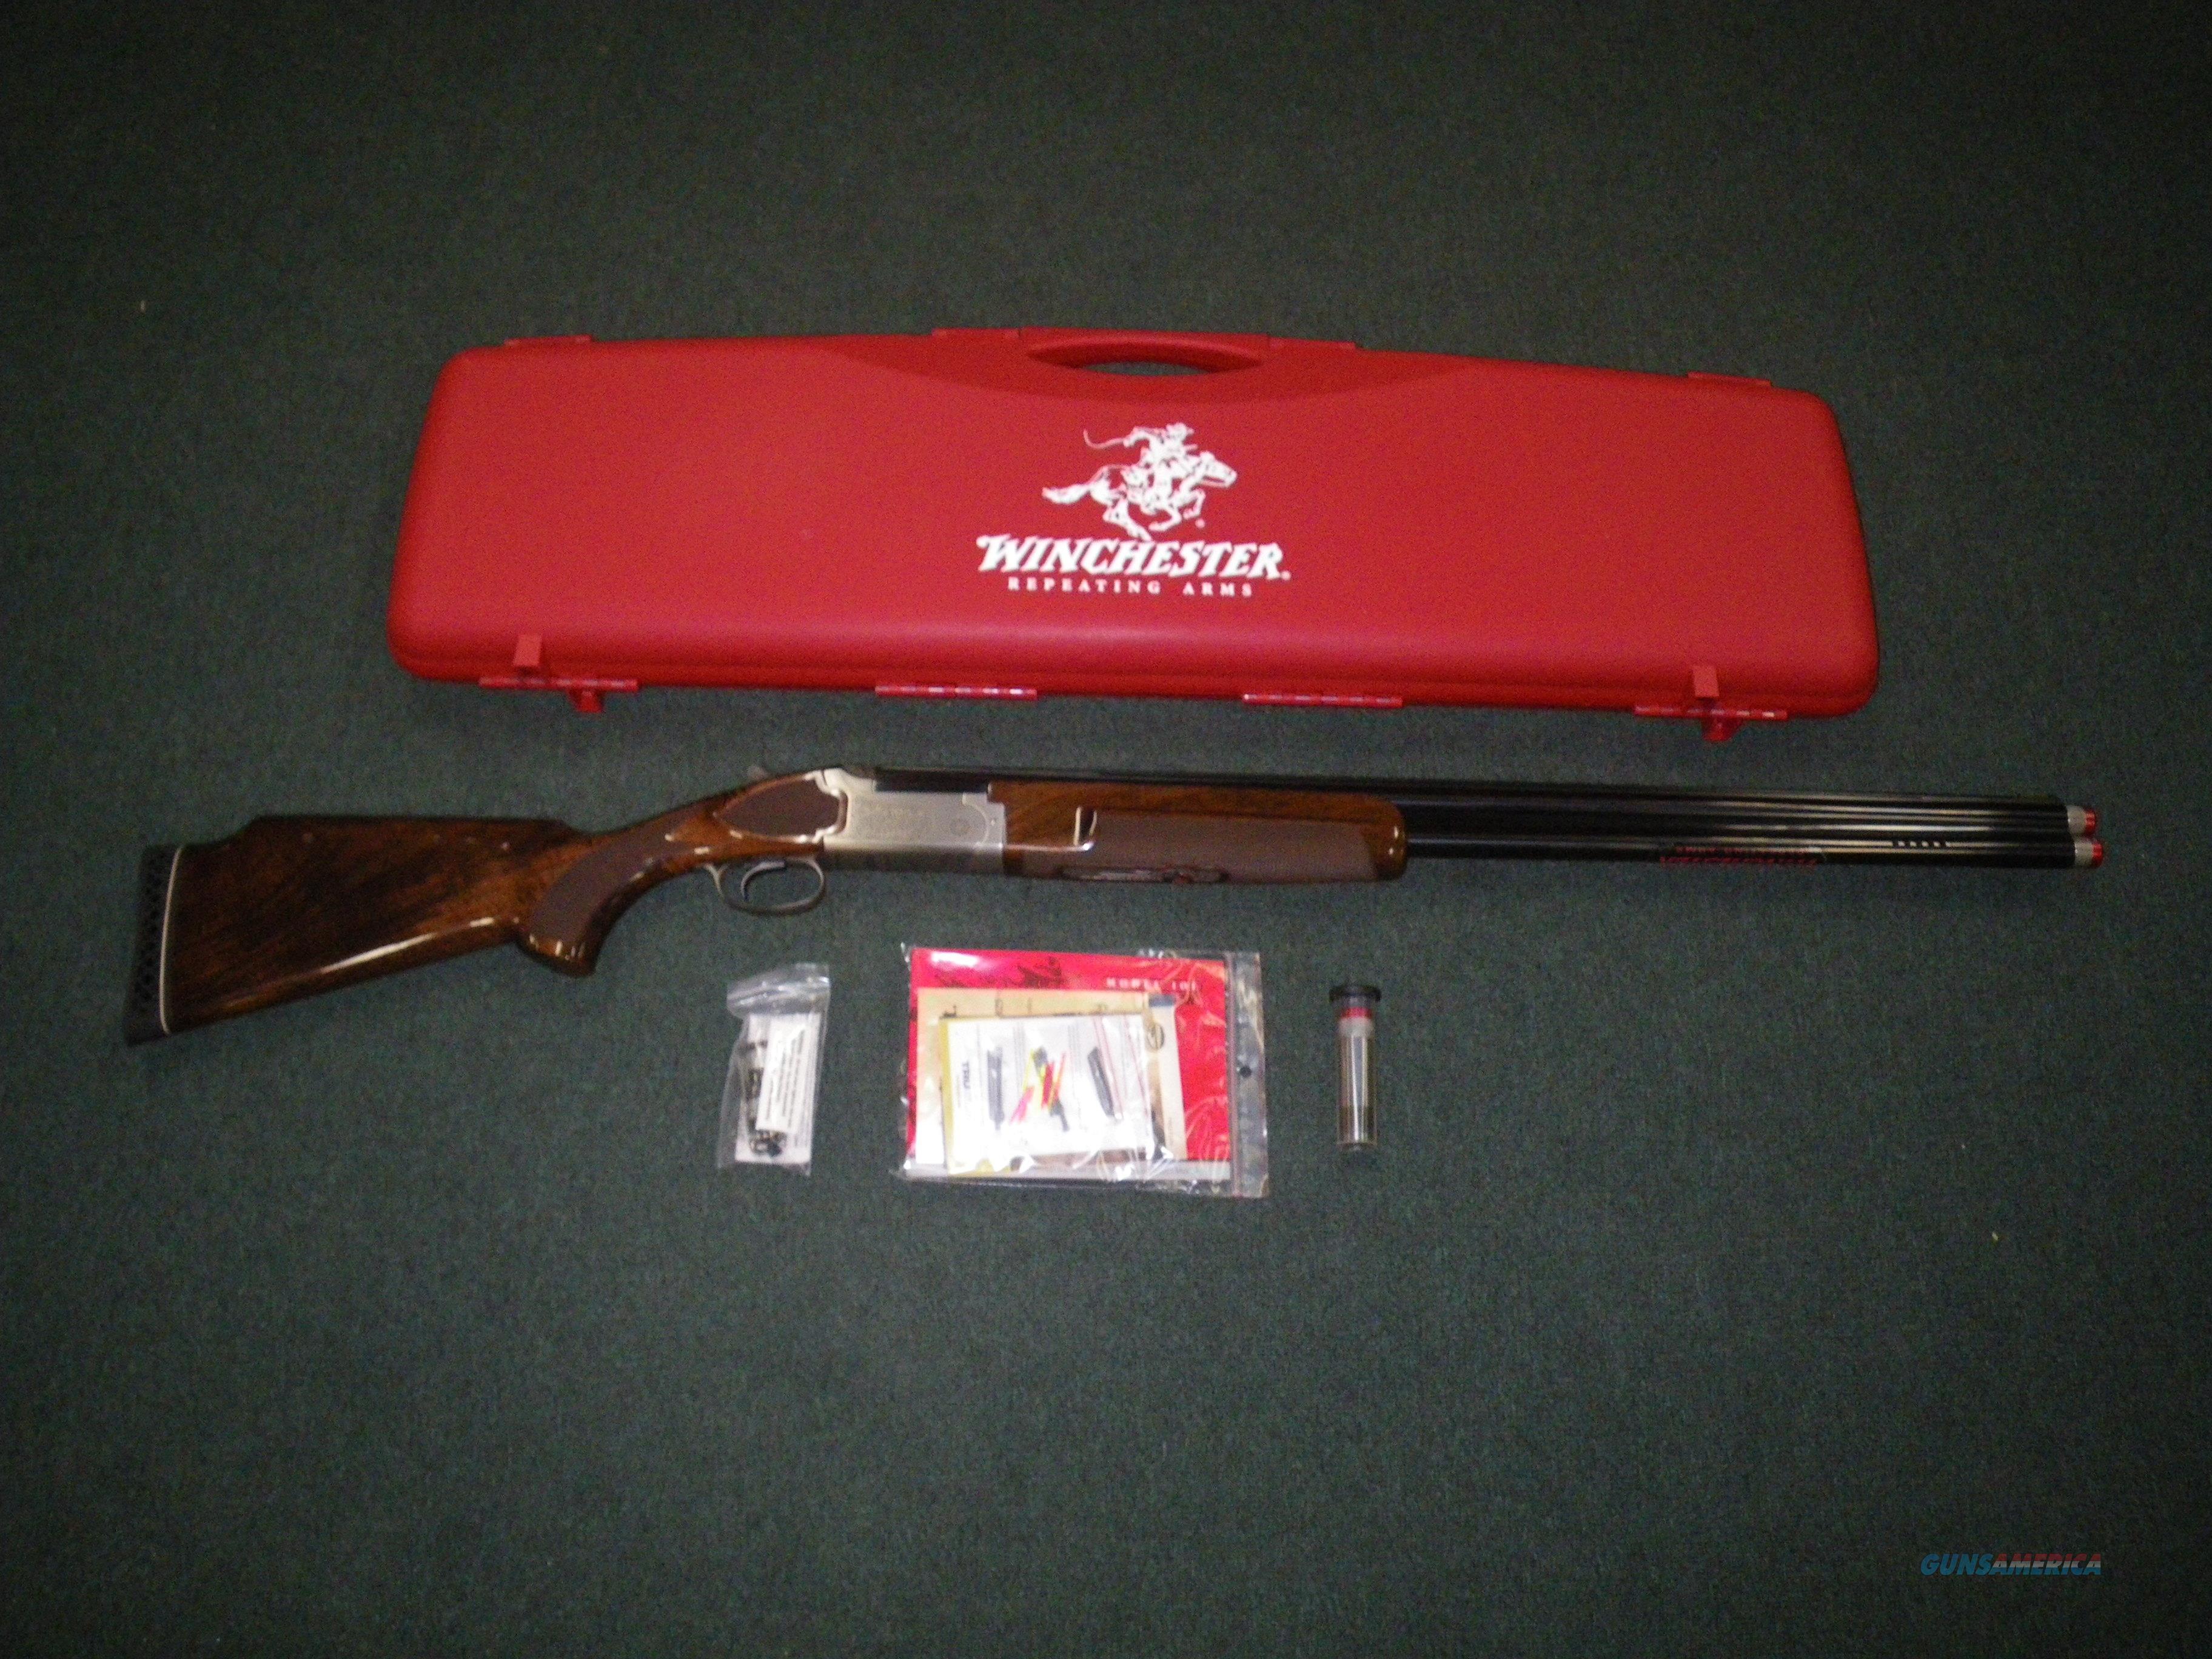 "Winchester Model 101 Pigeon Trap Adj Comb 12ga 30"" #513059493  Guns > Shotguns > Winchester Shotguns - Modern > O/U > Hunting"